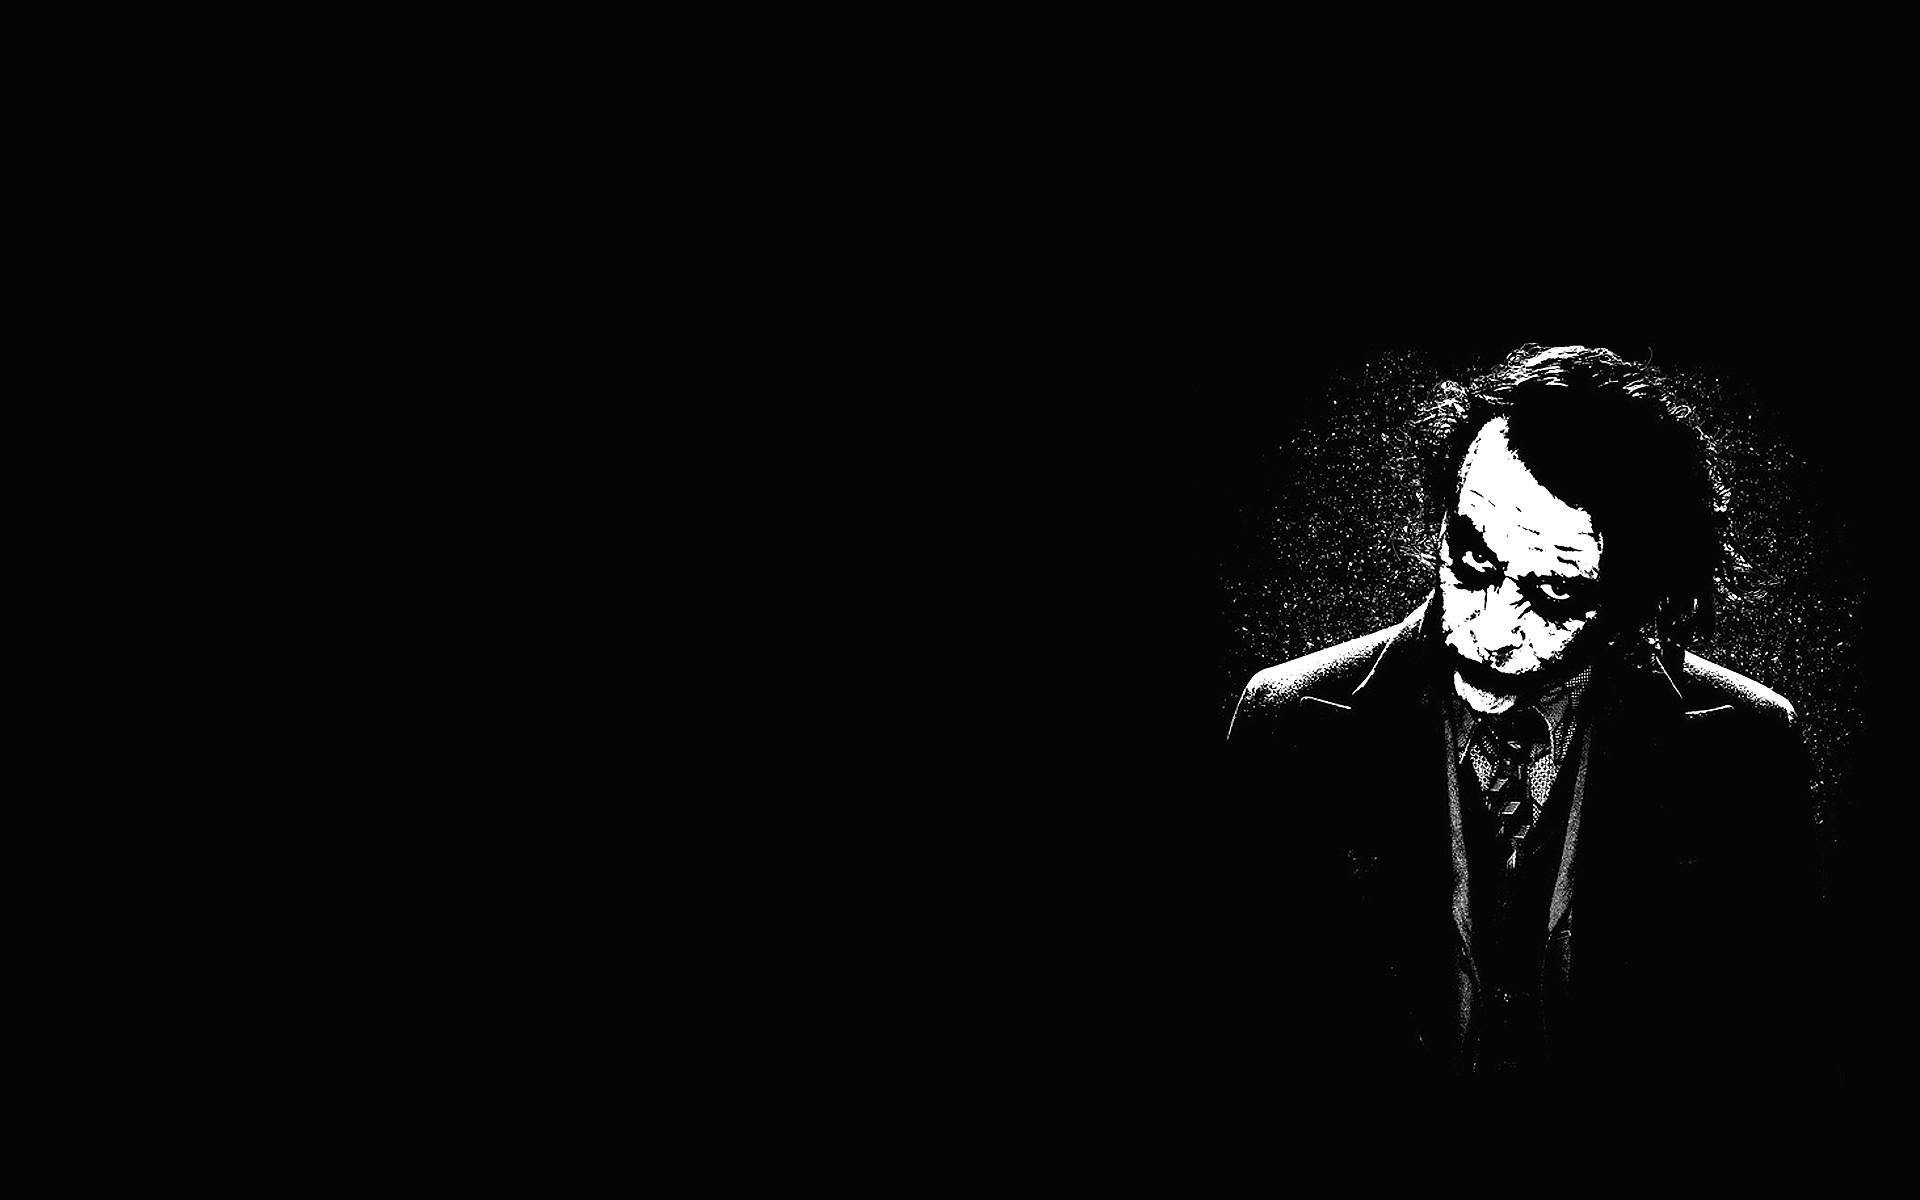 Joker Hd wallpaper – 1157712